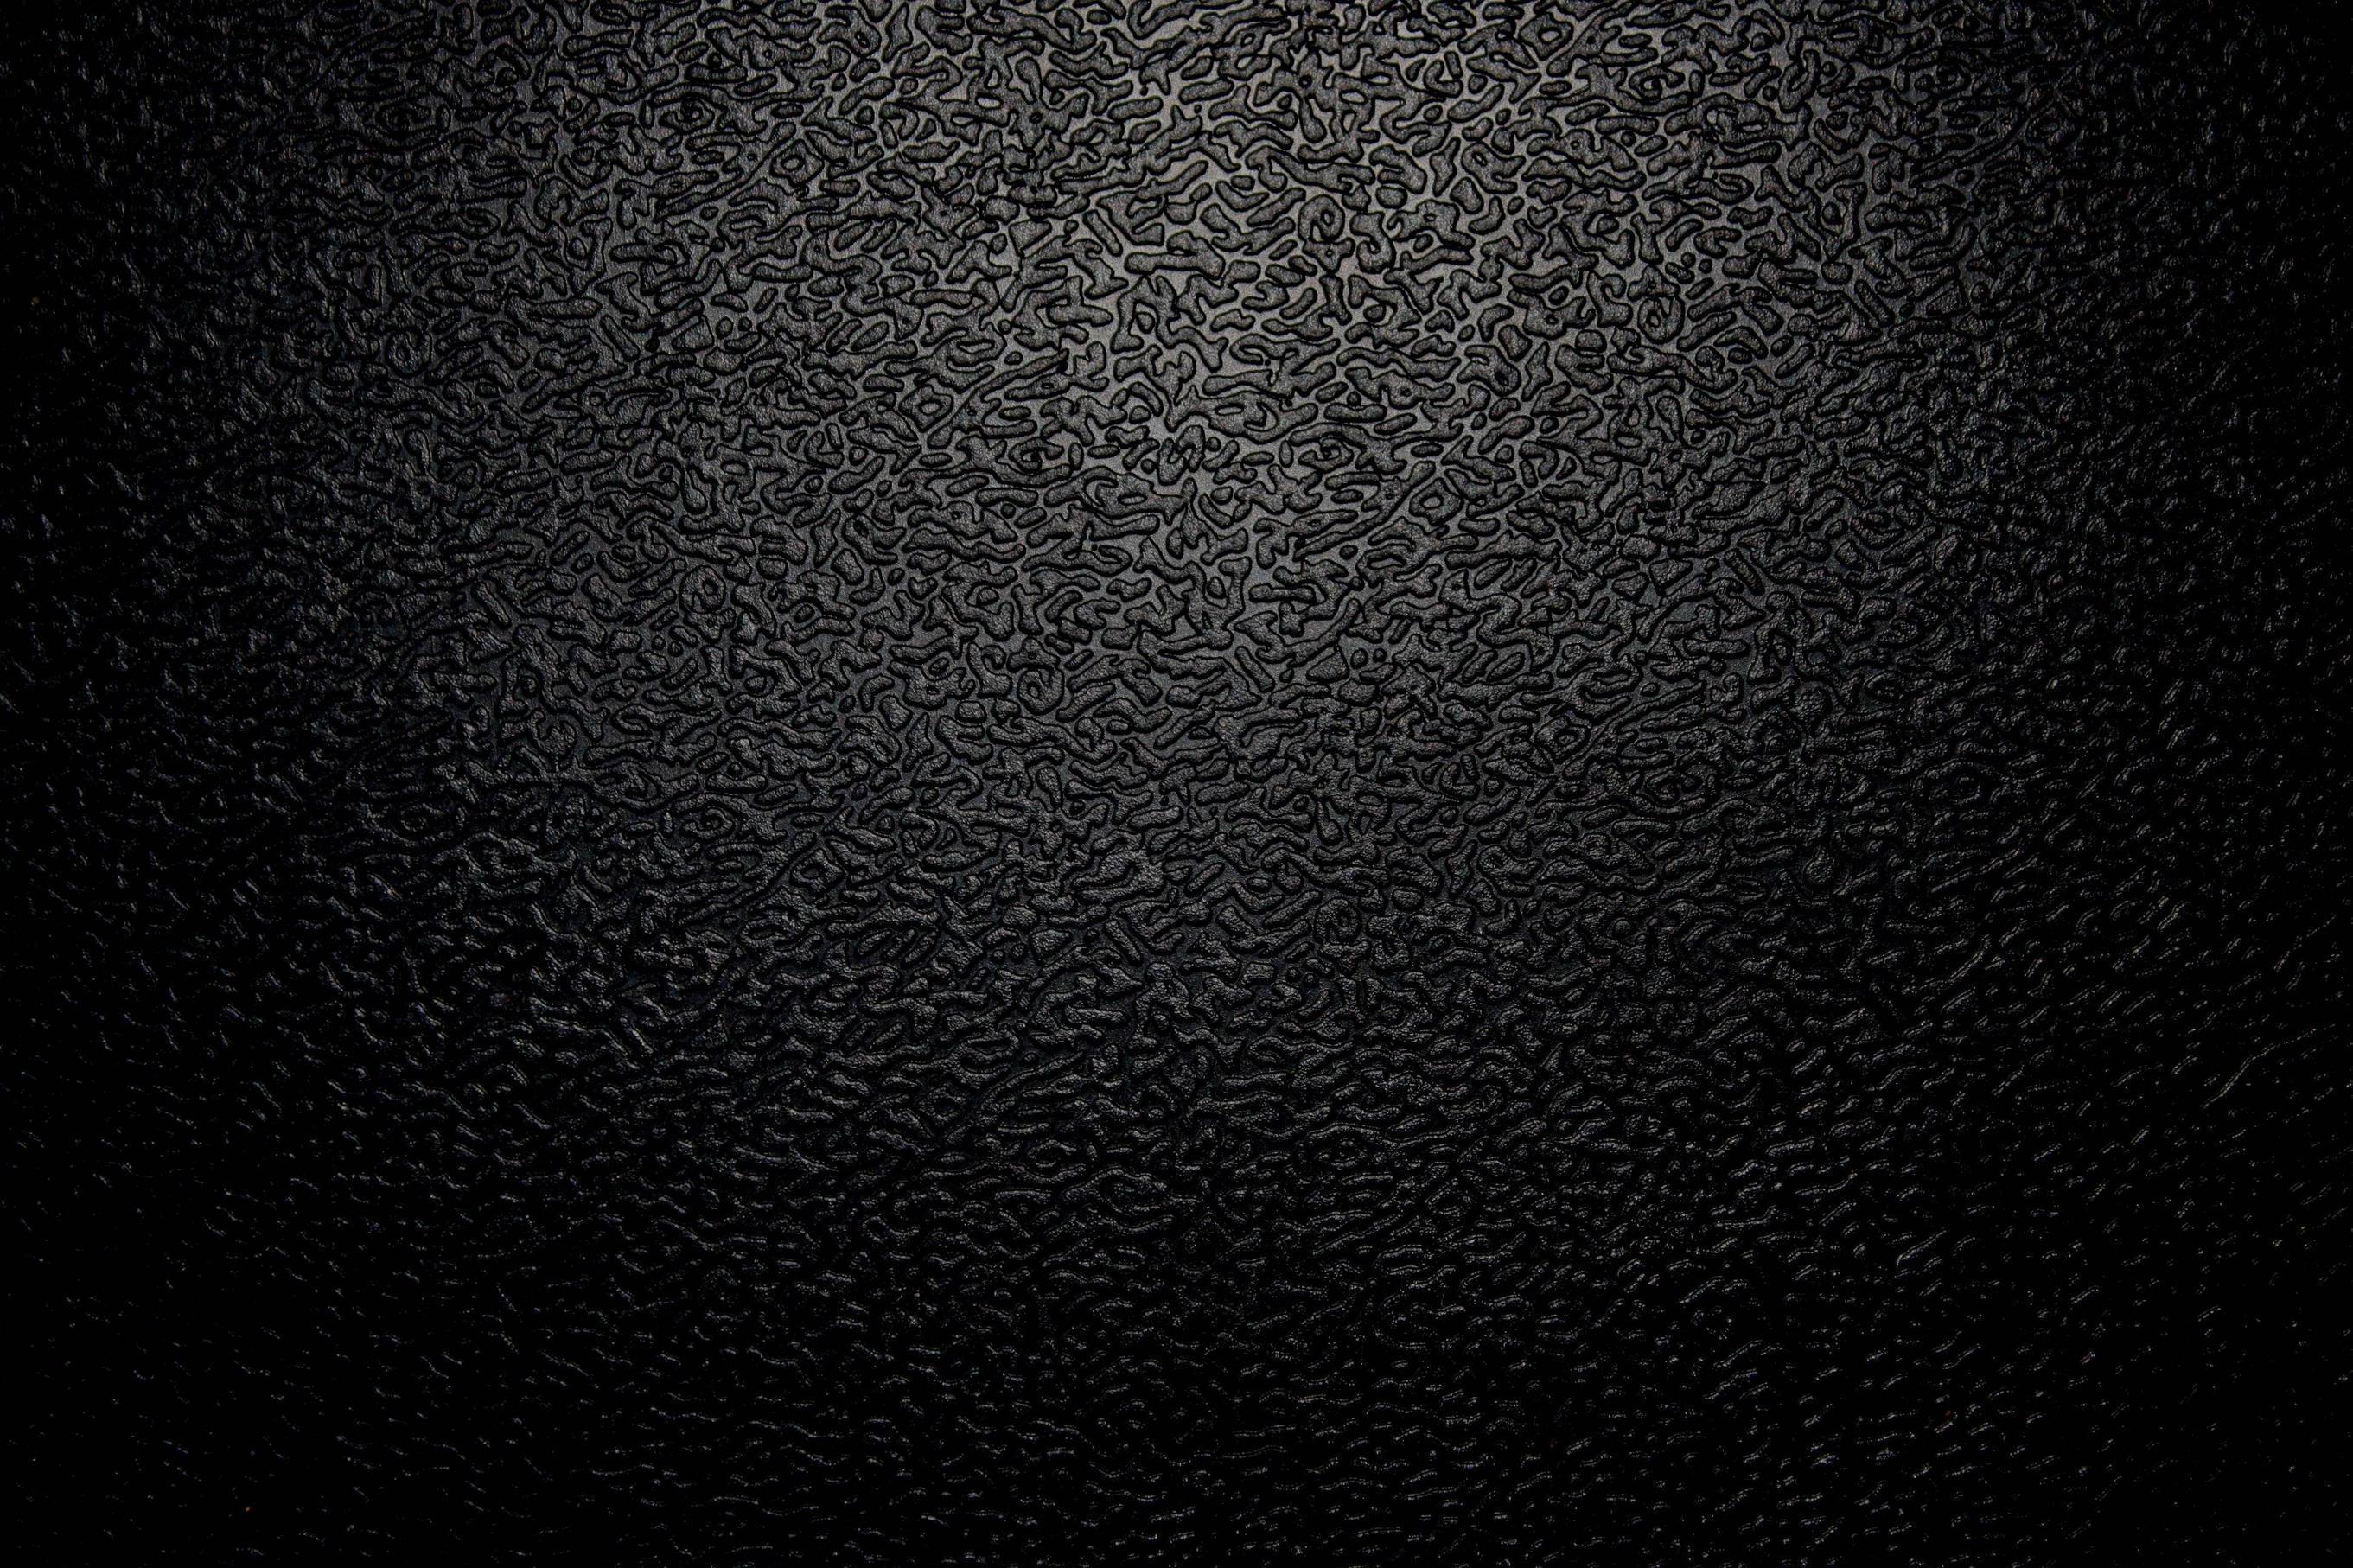 black texture wallpaper hd - photo #36